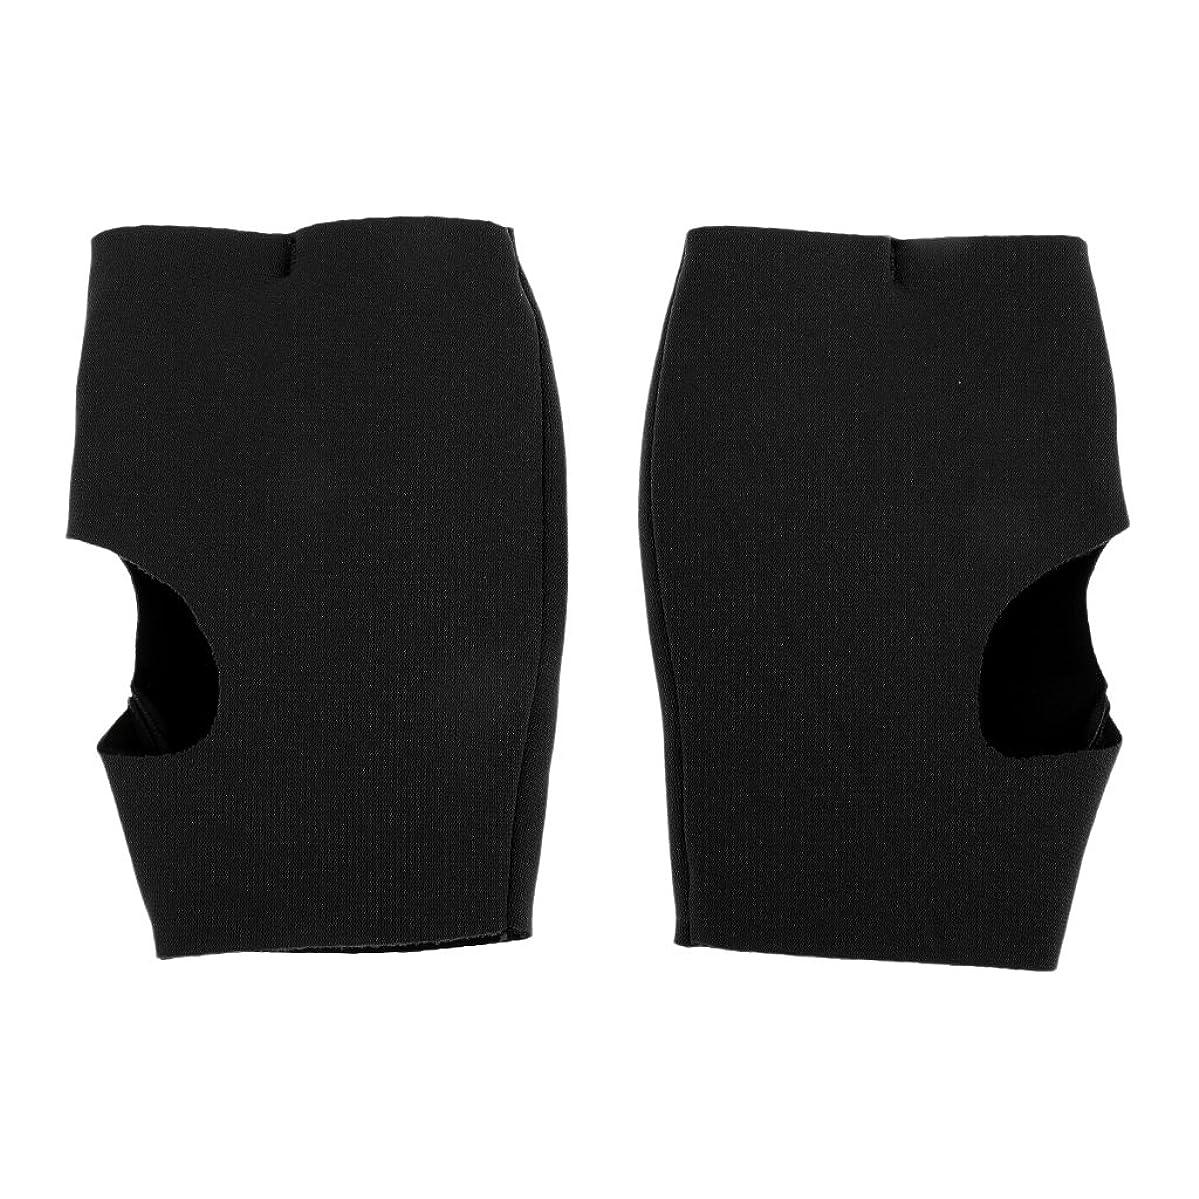 simhoa 2mm Neoprene Waterski Wakeboard Jetski Kayak Paddling Gloves Hand Palm Protector